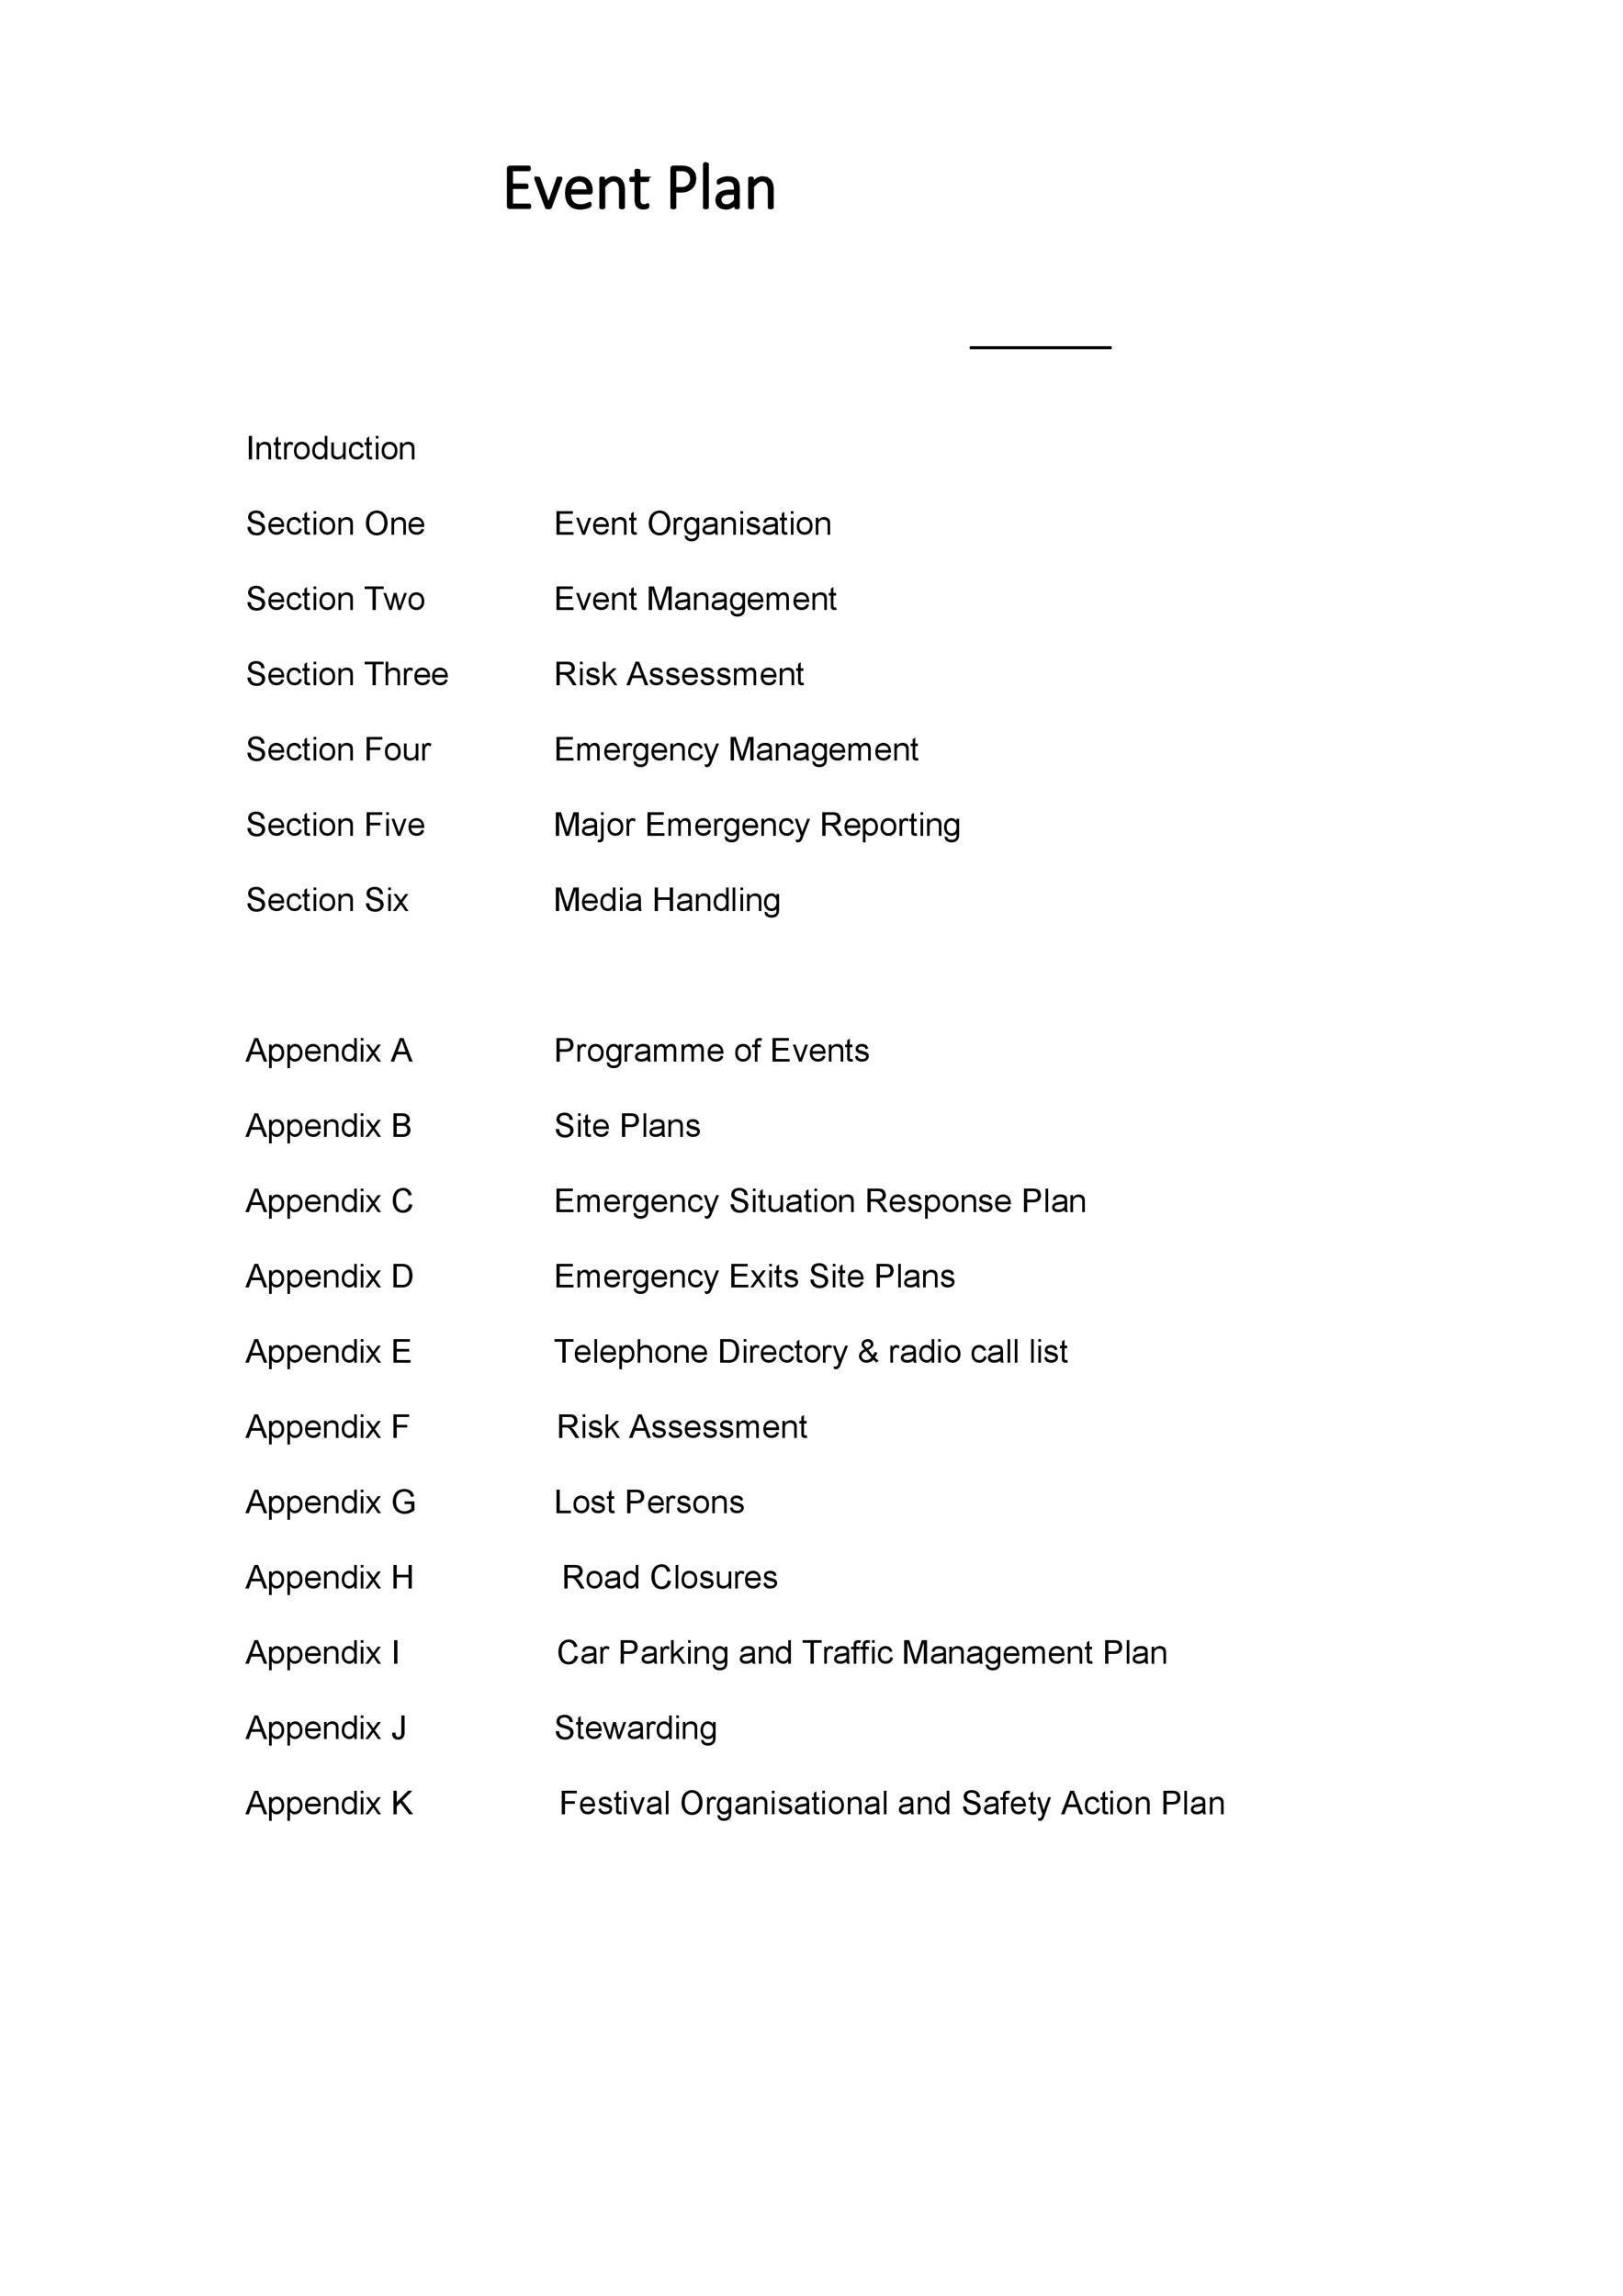 004 Incredible Event Planning Worksheet Template High Def  Planner Checklist BudgetFull